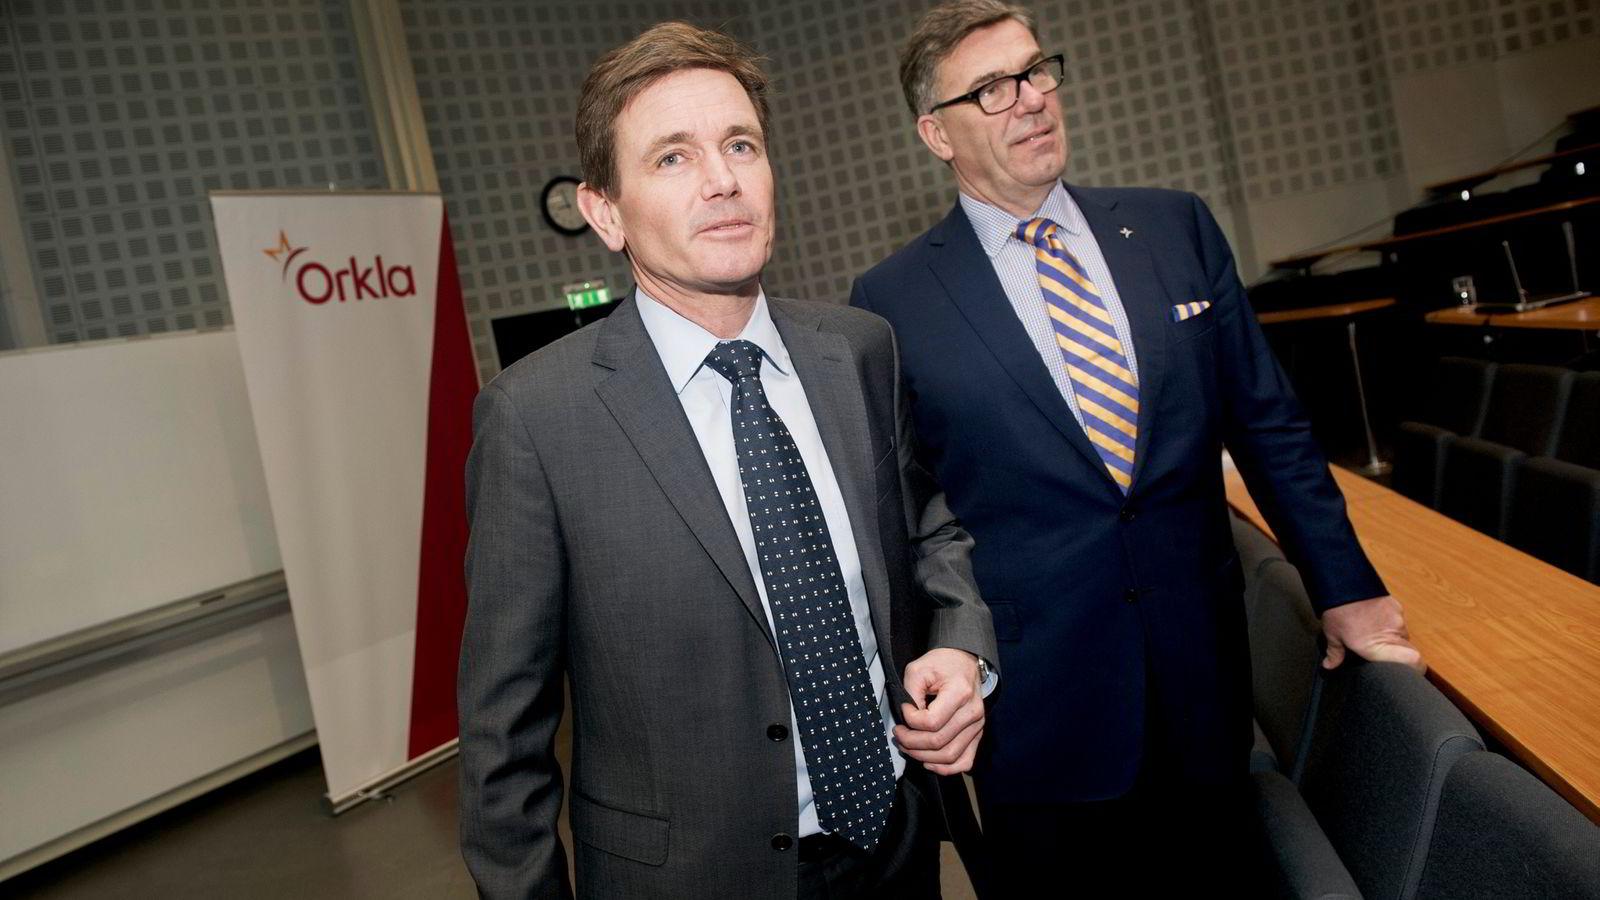 Orkla-sjef Peter A. Ruzicka (til venstre) vil ha færre og større fabrikker. Her sammen med hovedeier Stein Erik Hagen.